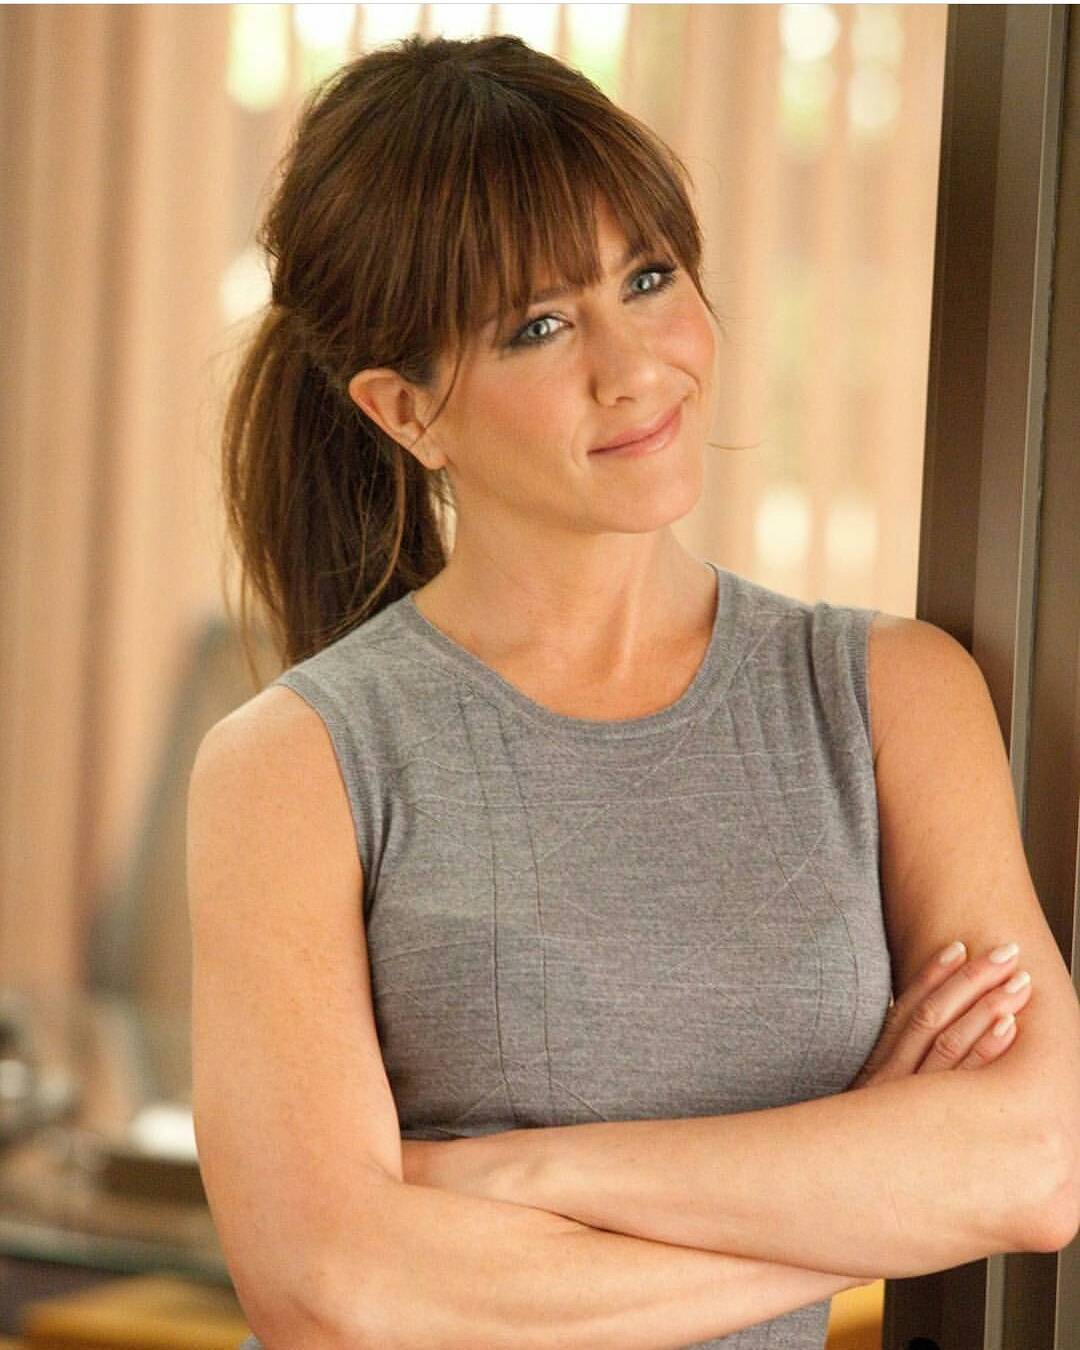 Jennifer Aniston Pics | Jennifer Aniston Photos - HD Actress Photo